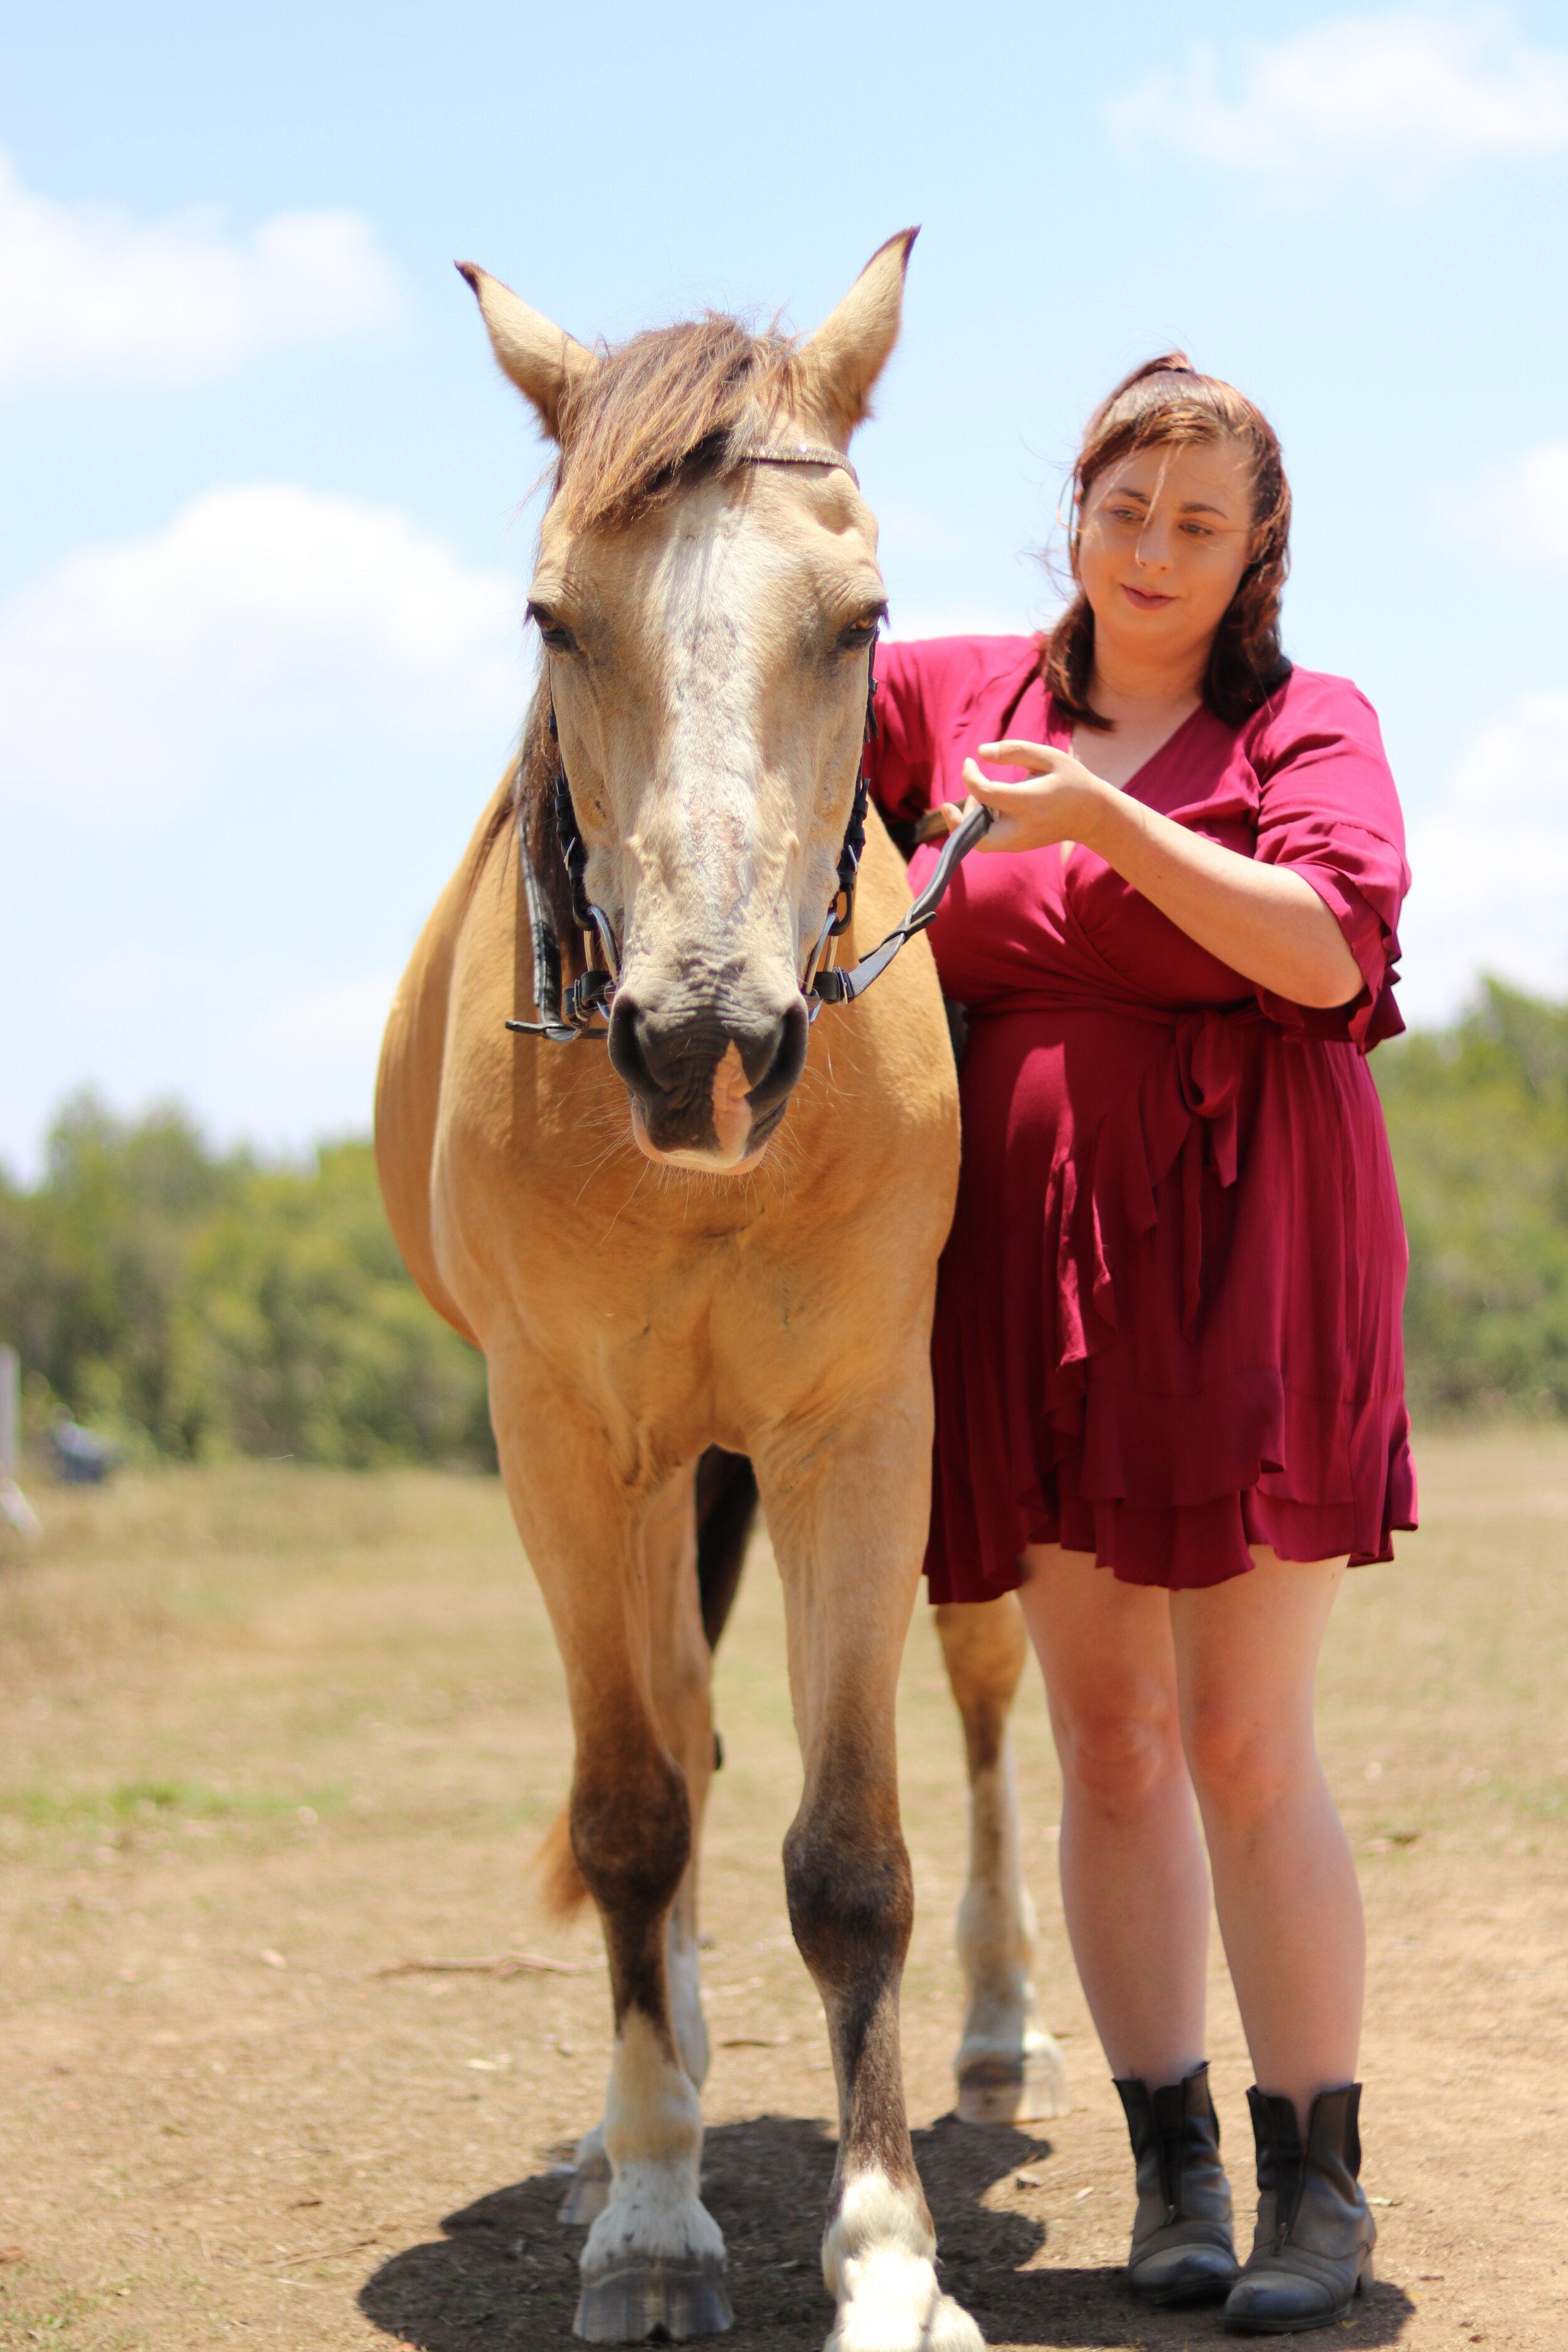 Equestrian Movement Bringing A Senior Horse Back Into Work